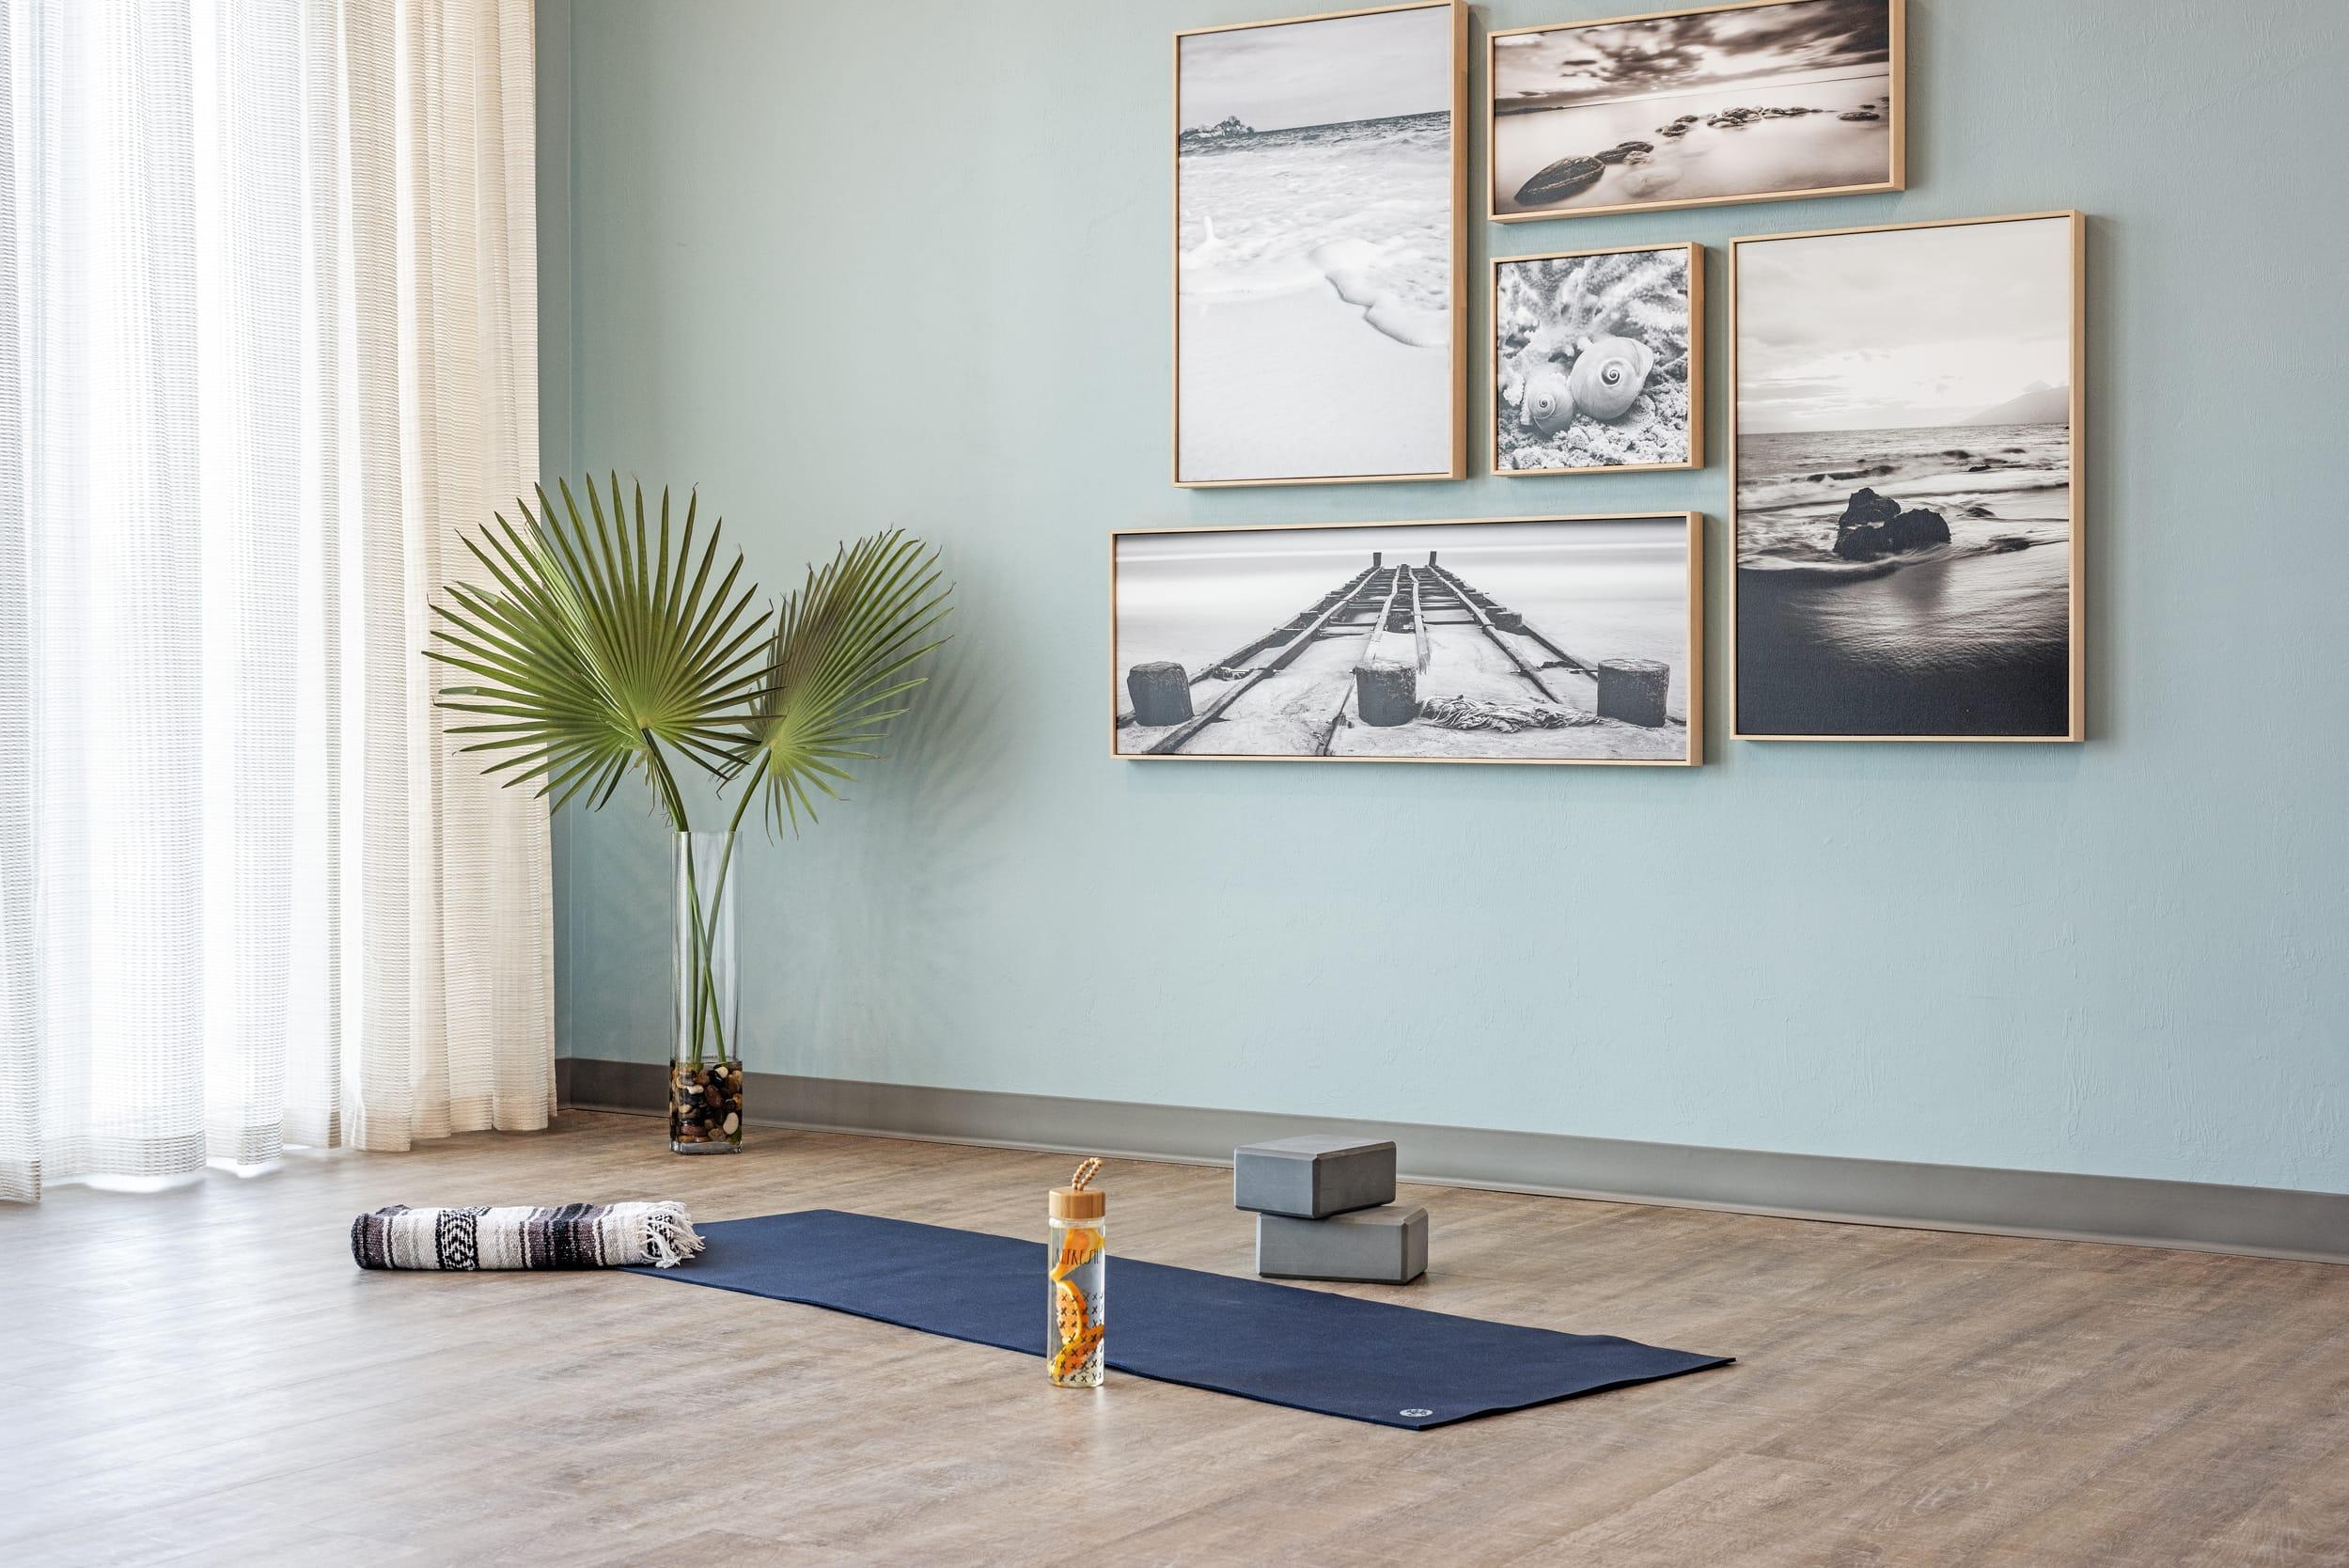 Studio121 Savona Club House Gym Yoga Mat Blocks